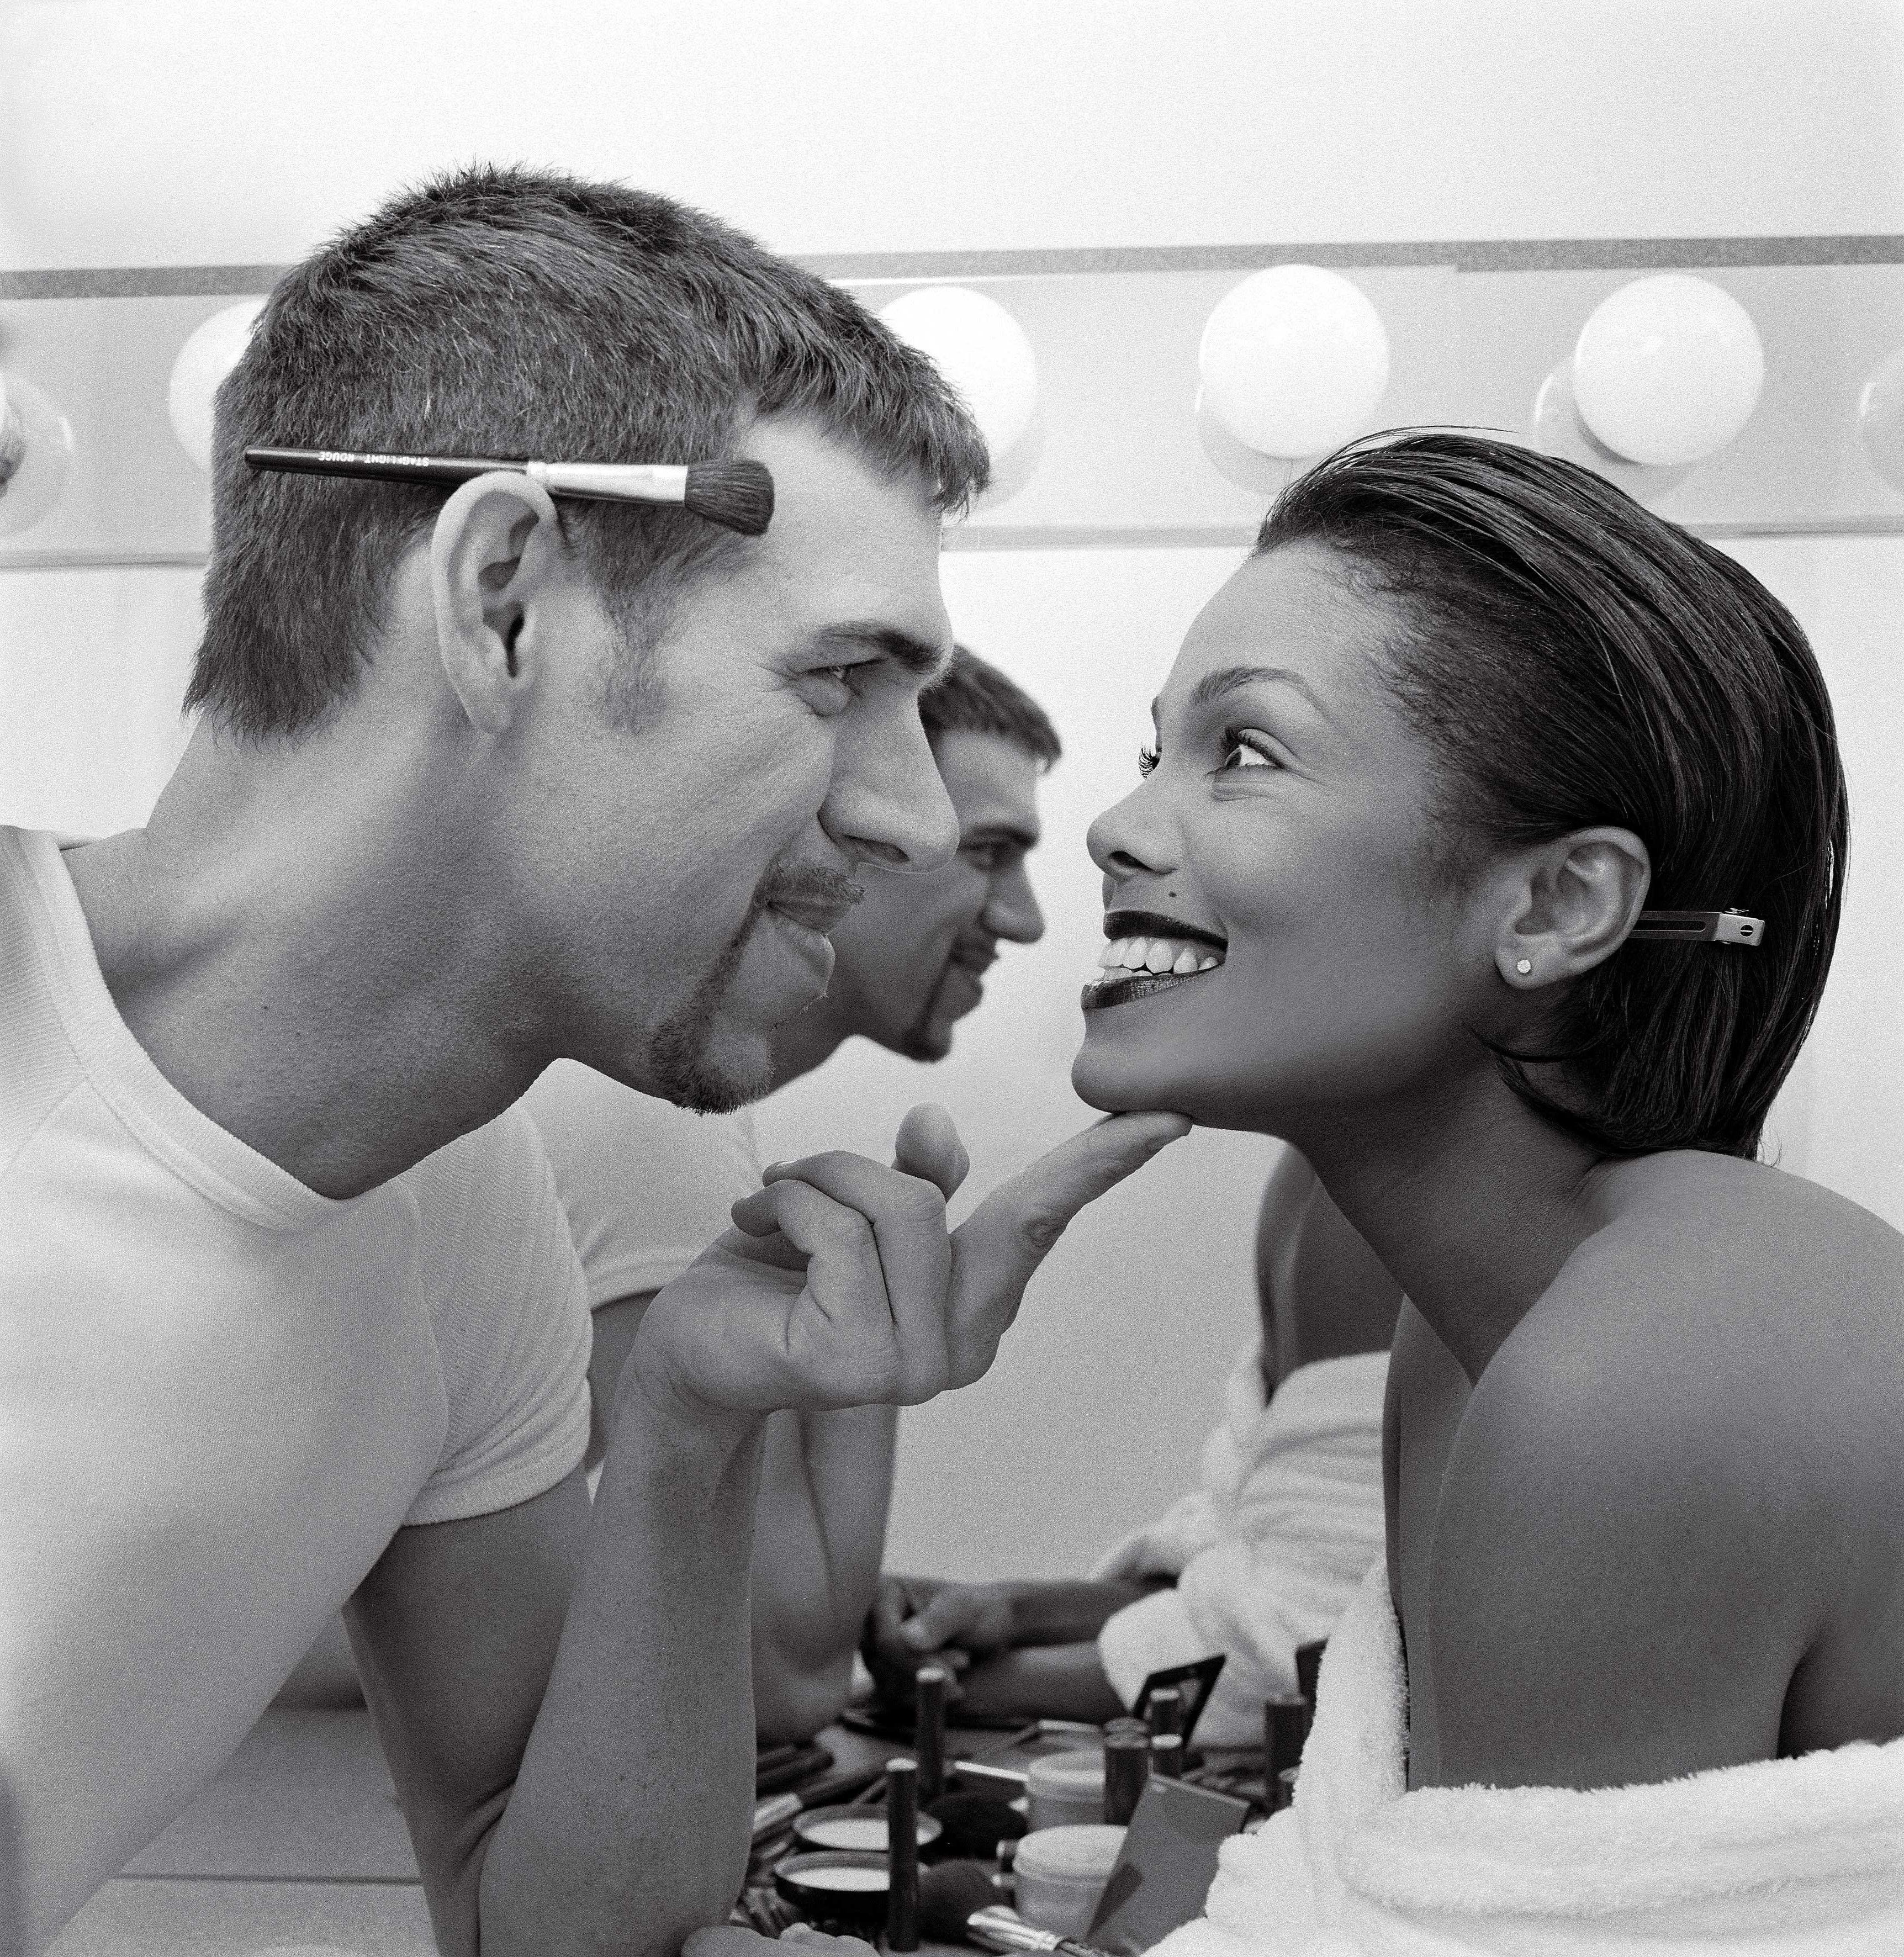 Jackson with makeup artist kevyn aucoin